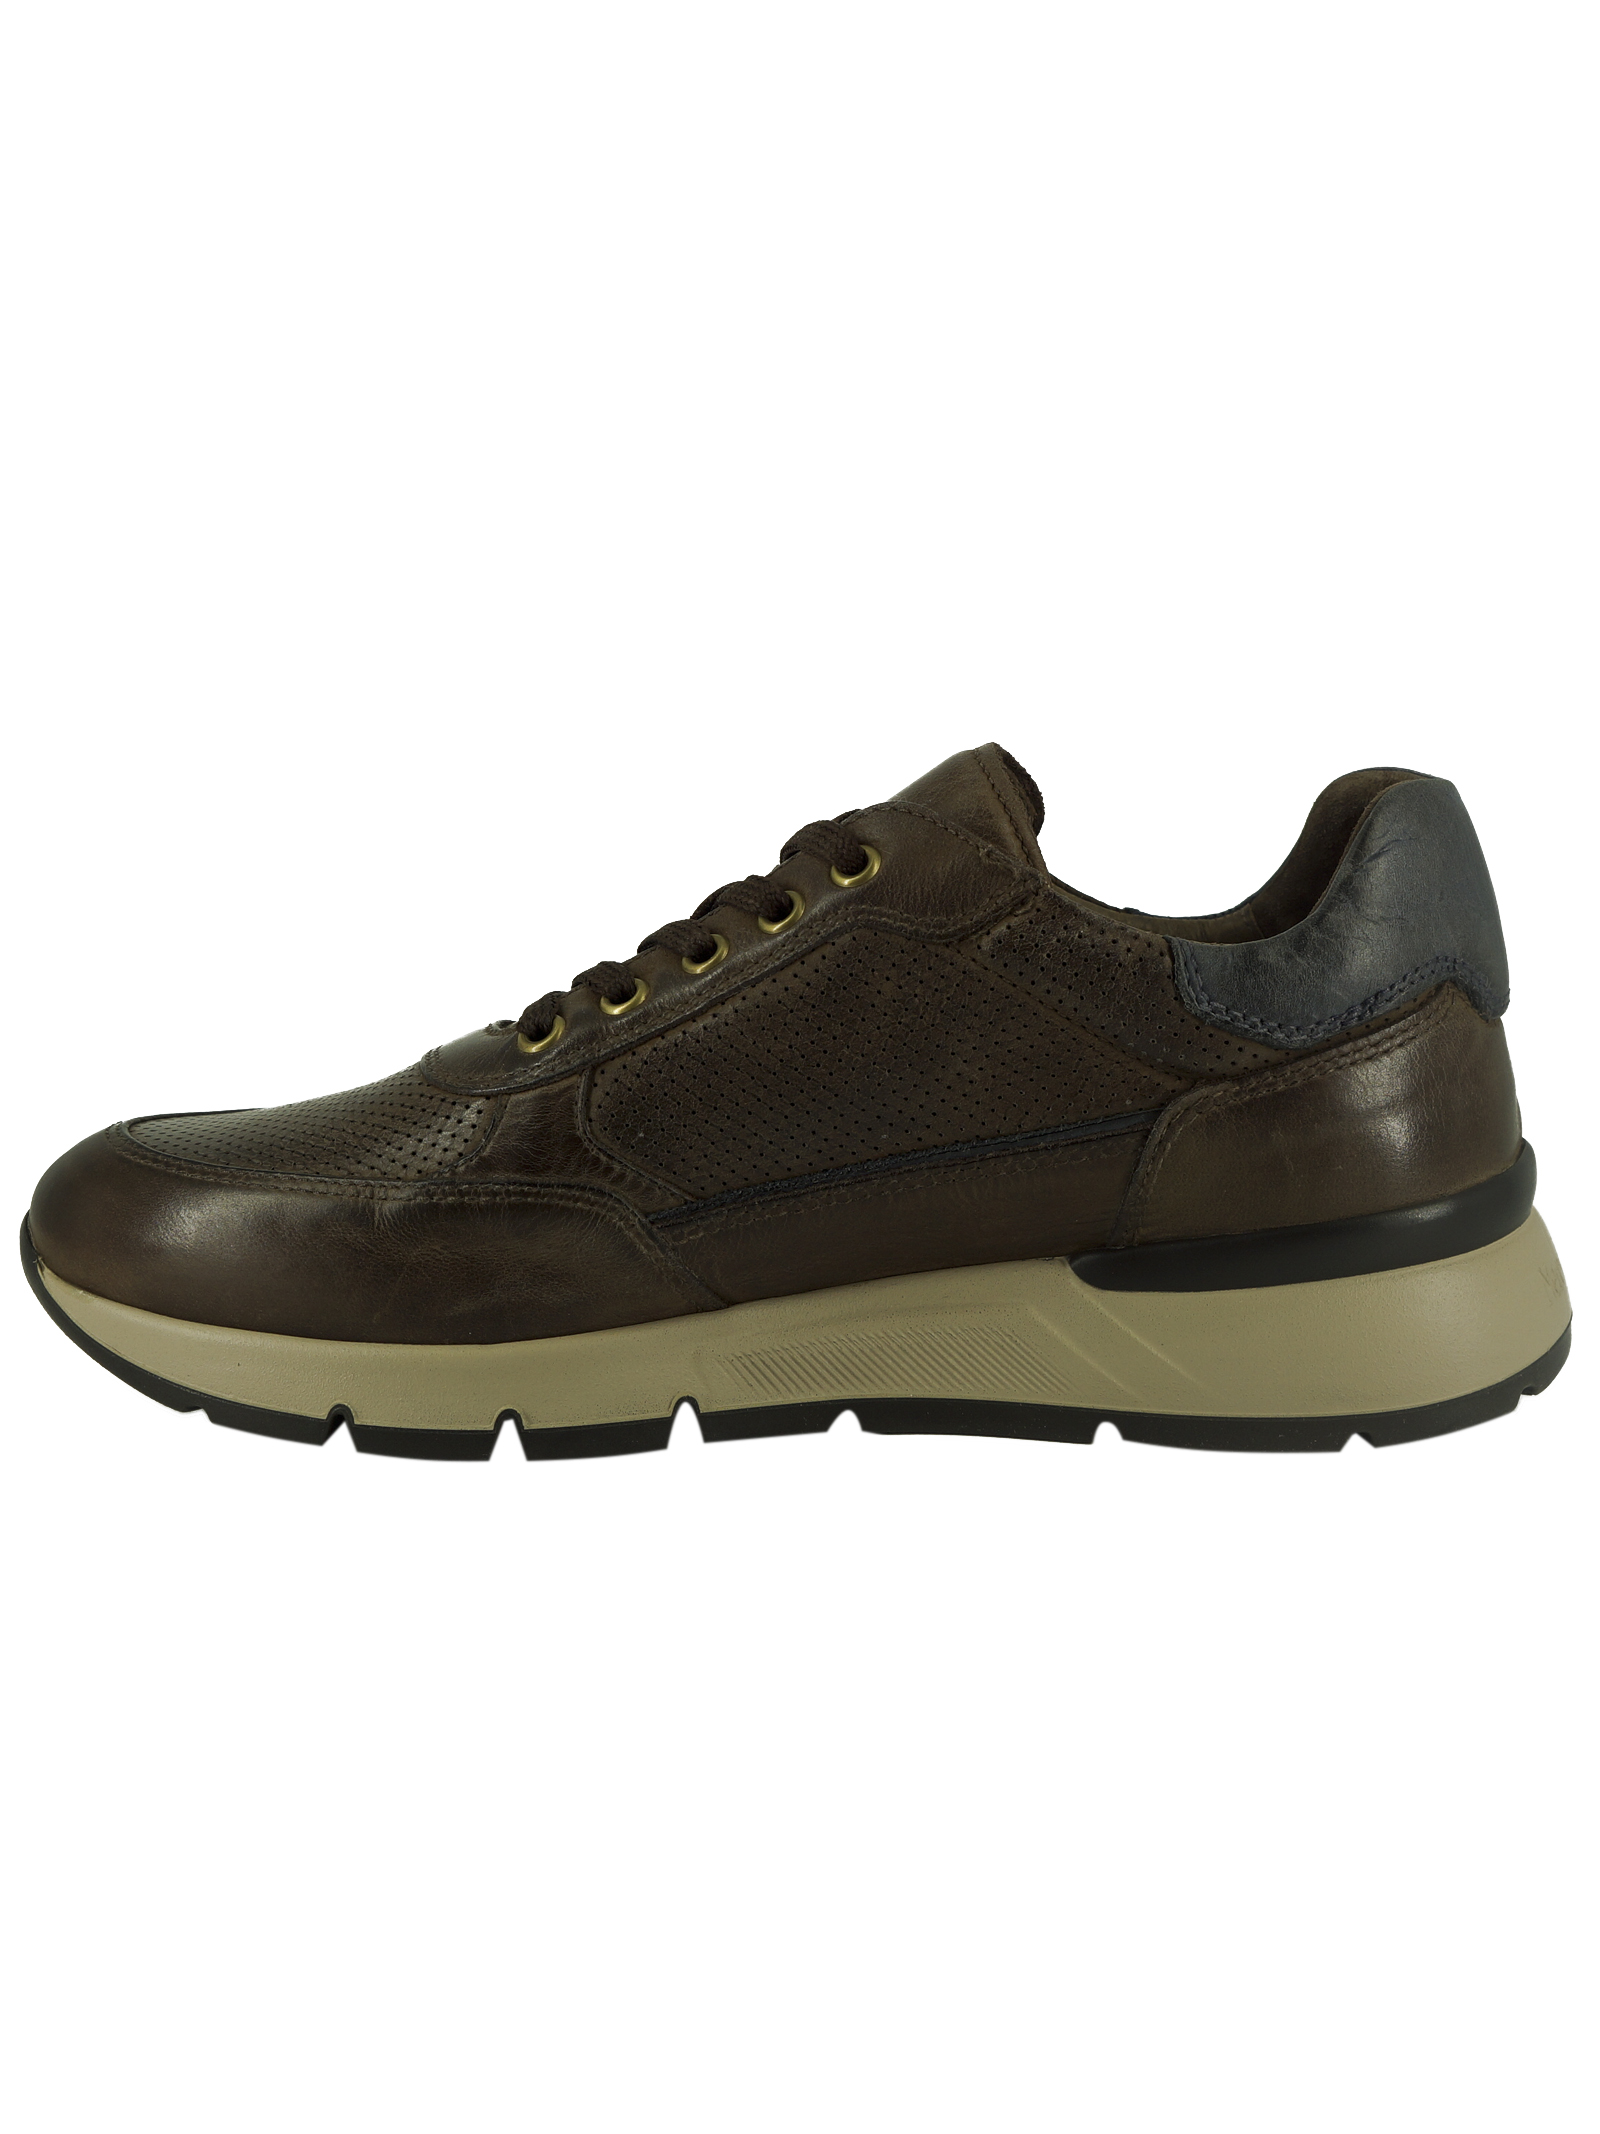 Sneakers Uomo in Pelle Nero Giardini Nero Giardini | Sneakers | E101991UMARRONE300